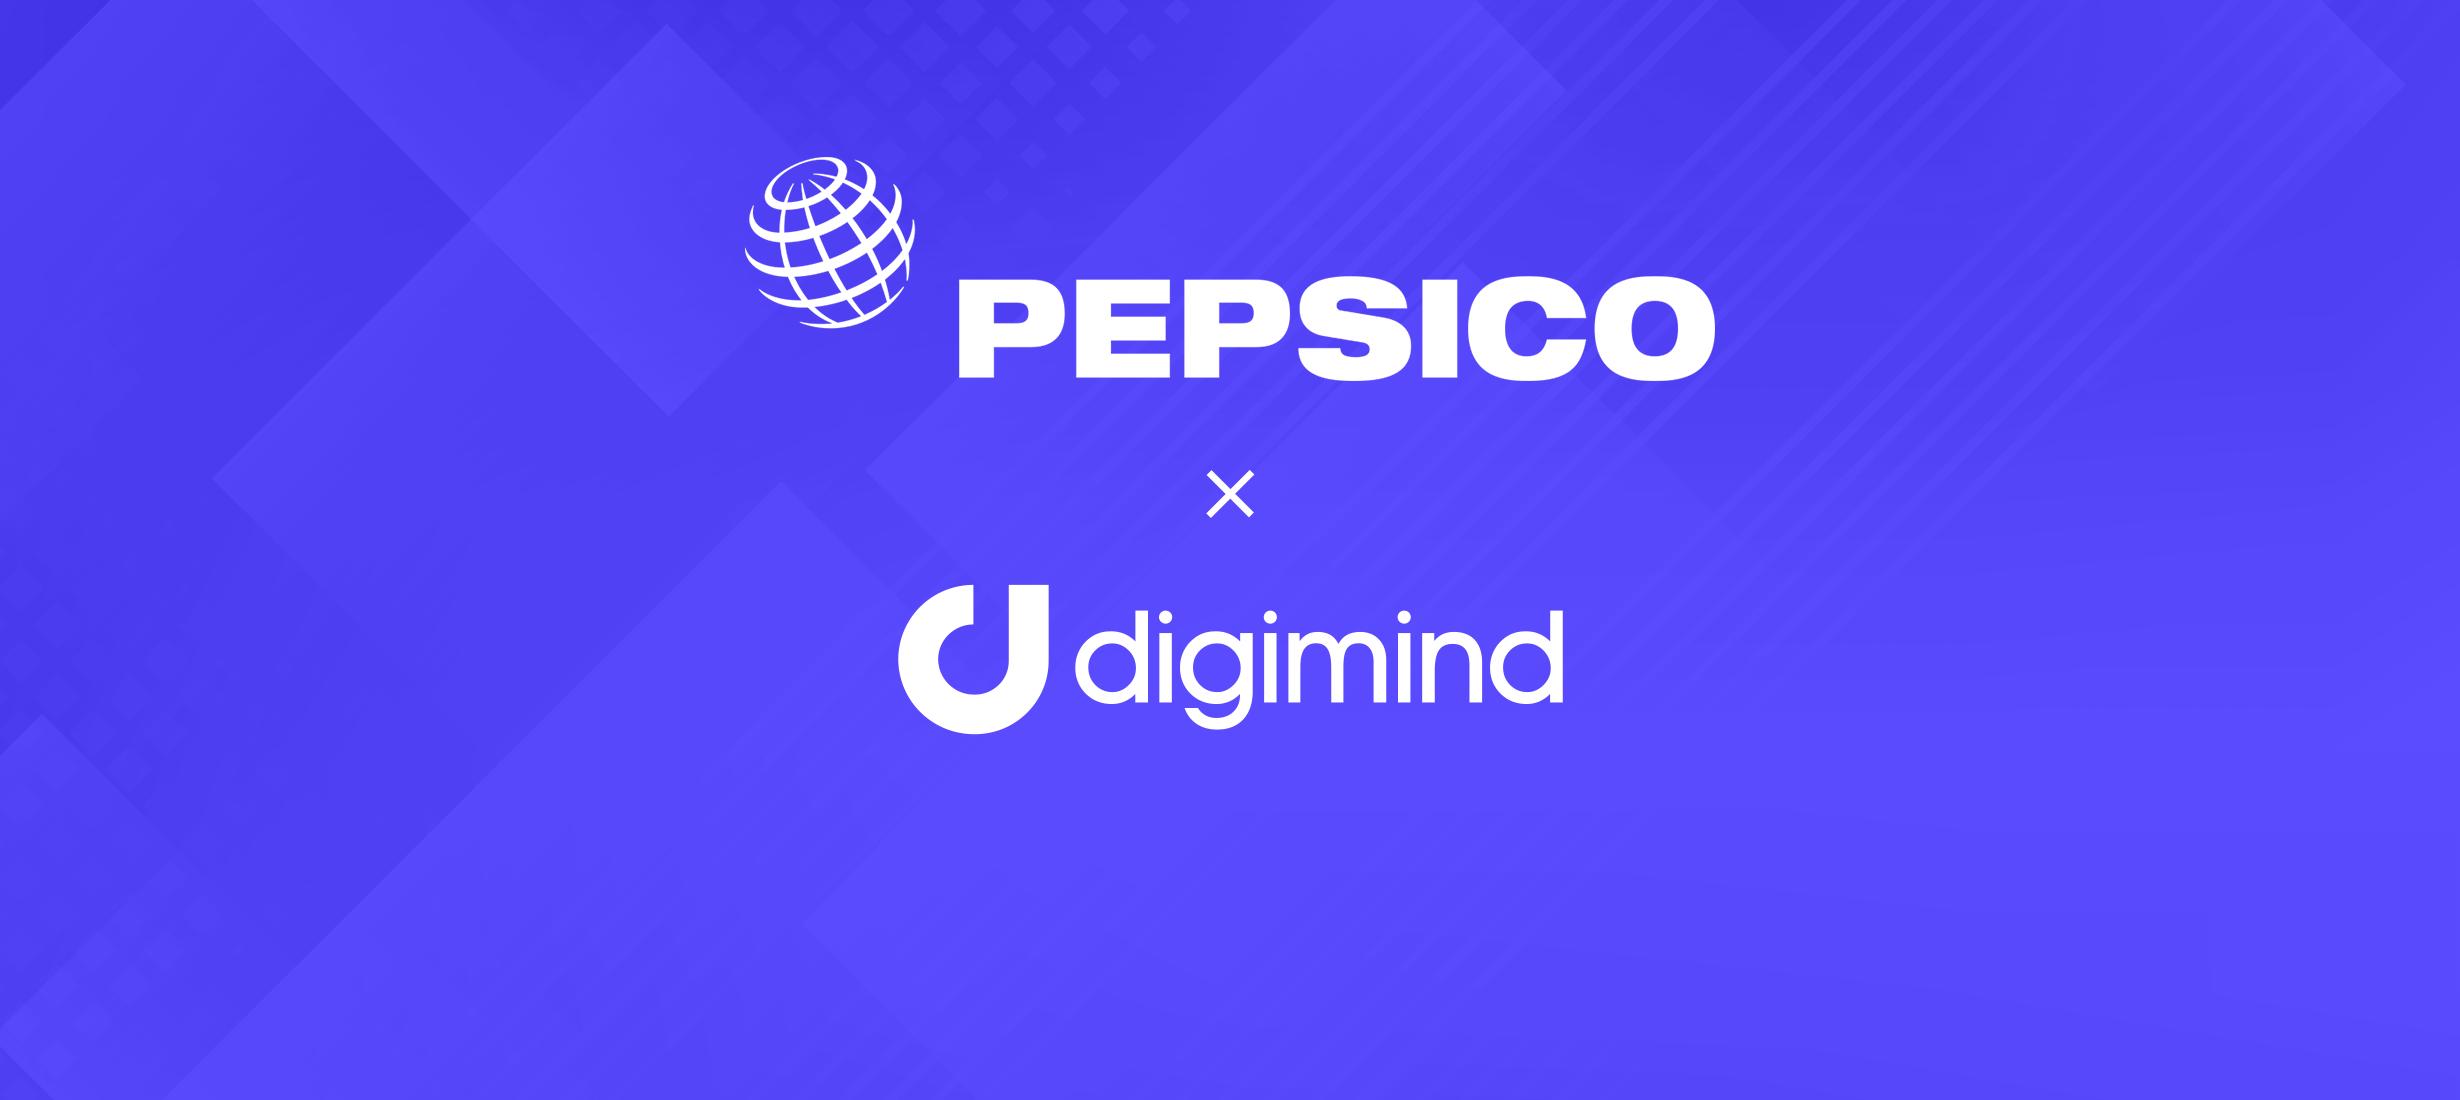 Pepsico x Digimind_Blogpost cover 2